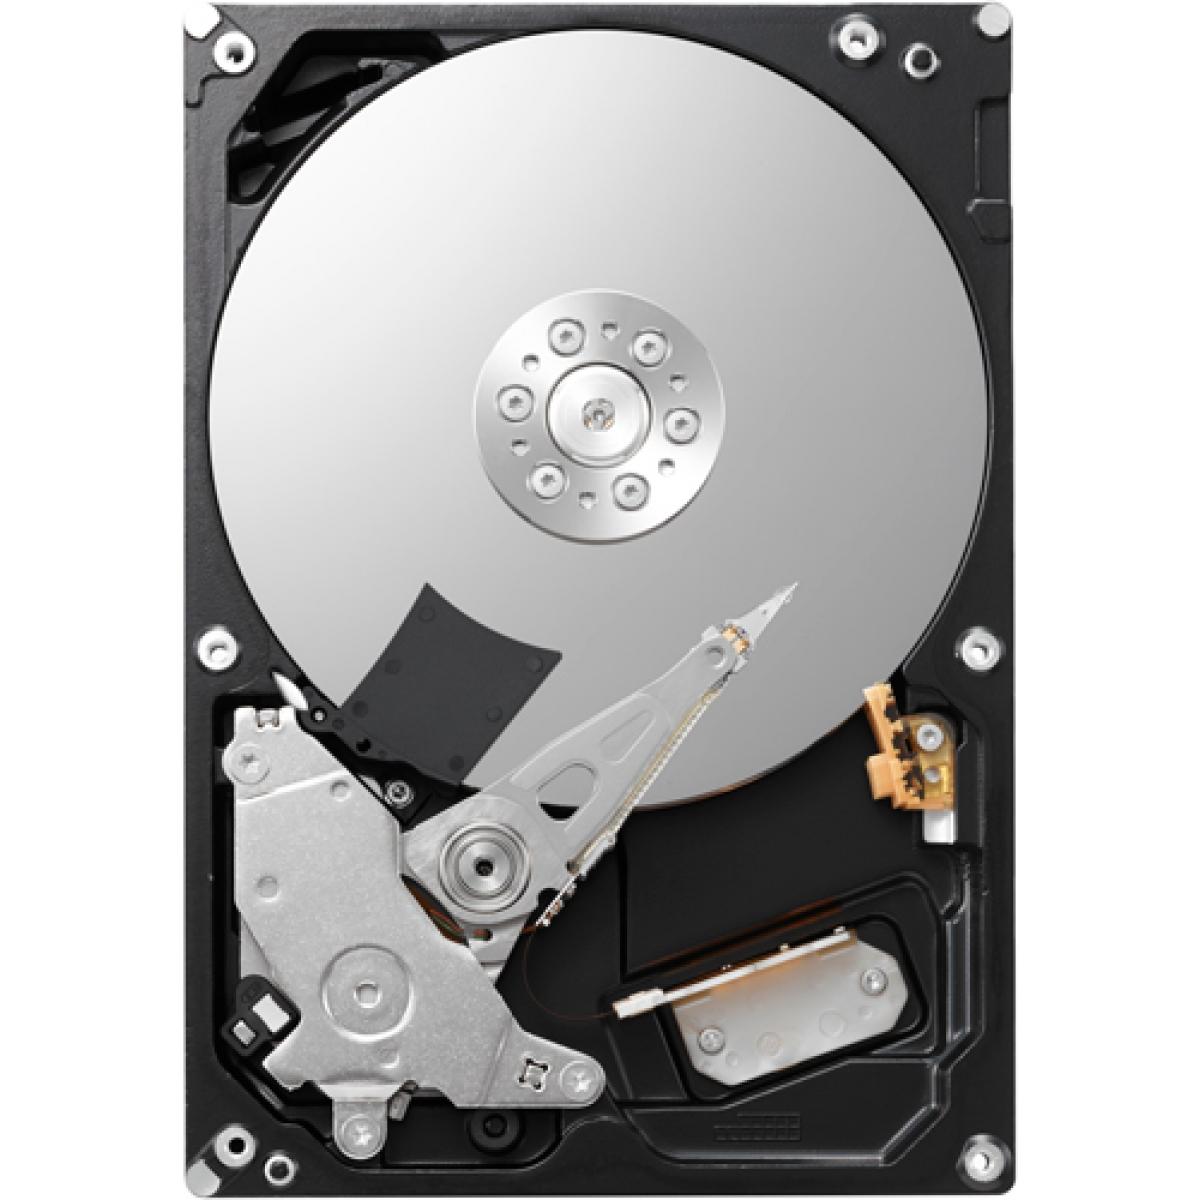 HD Toshiba P300 1TB, Sata III, 7200RPM, 64MB, HDWD110XZSTA - DESATIVADO